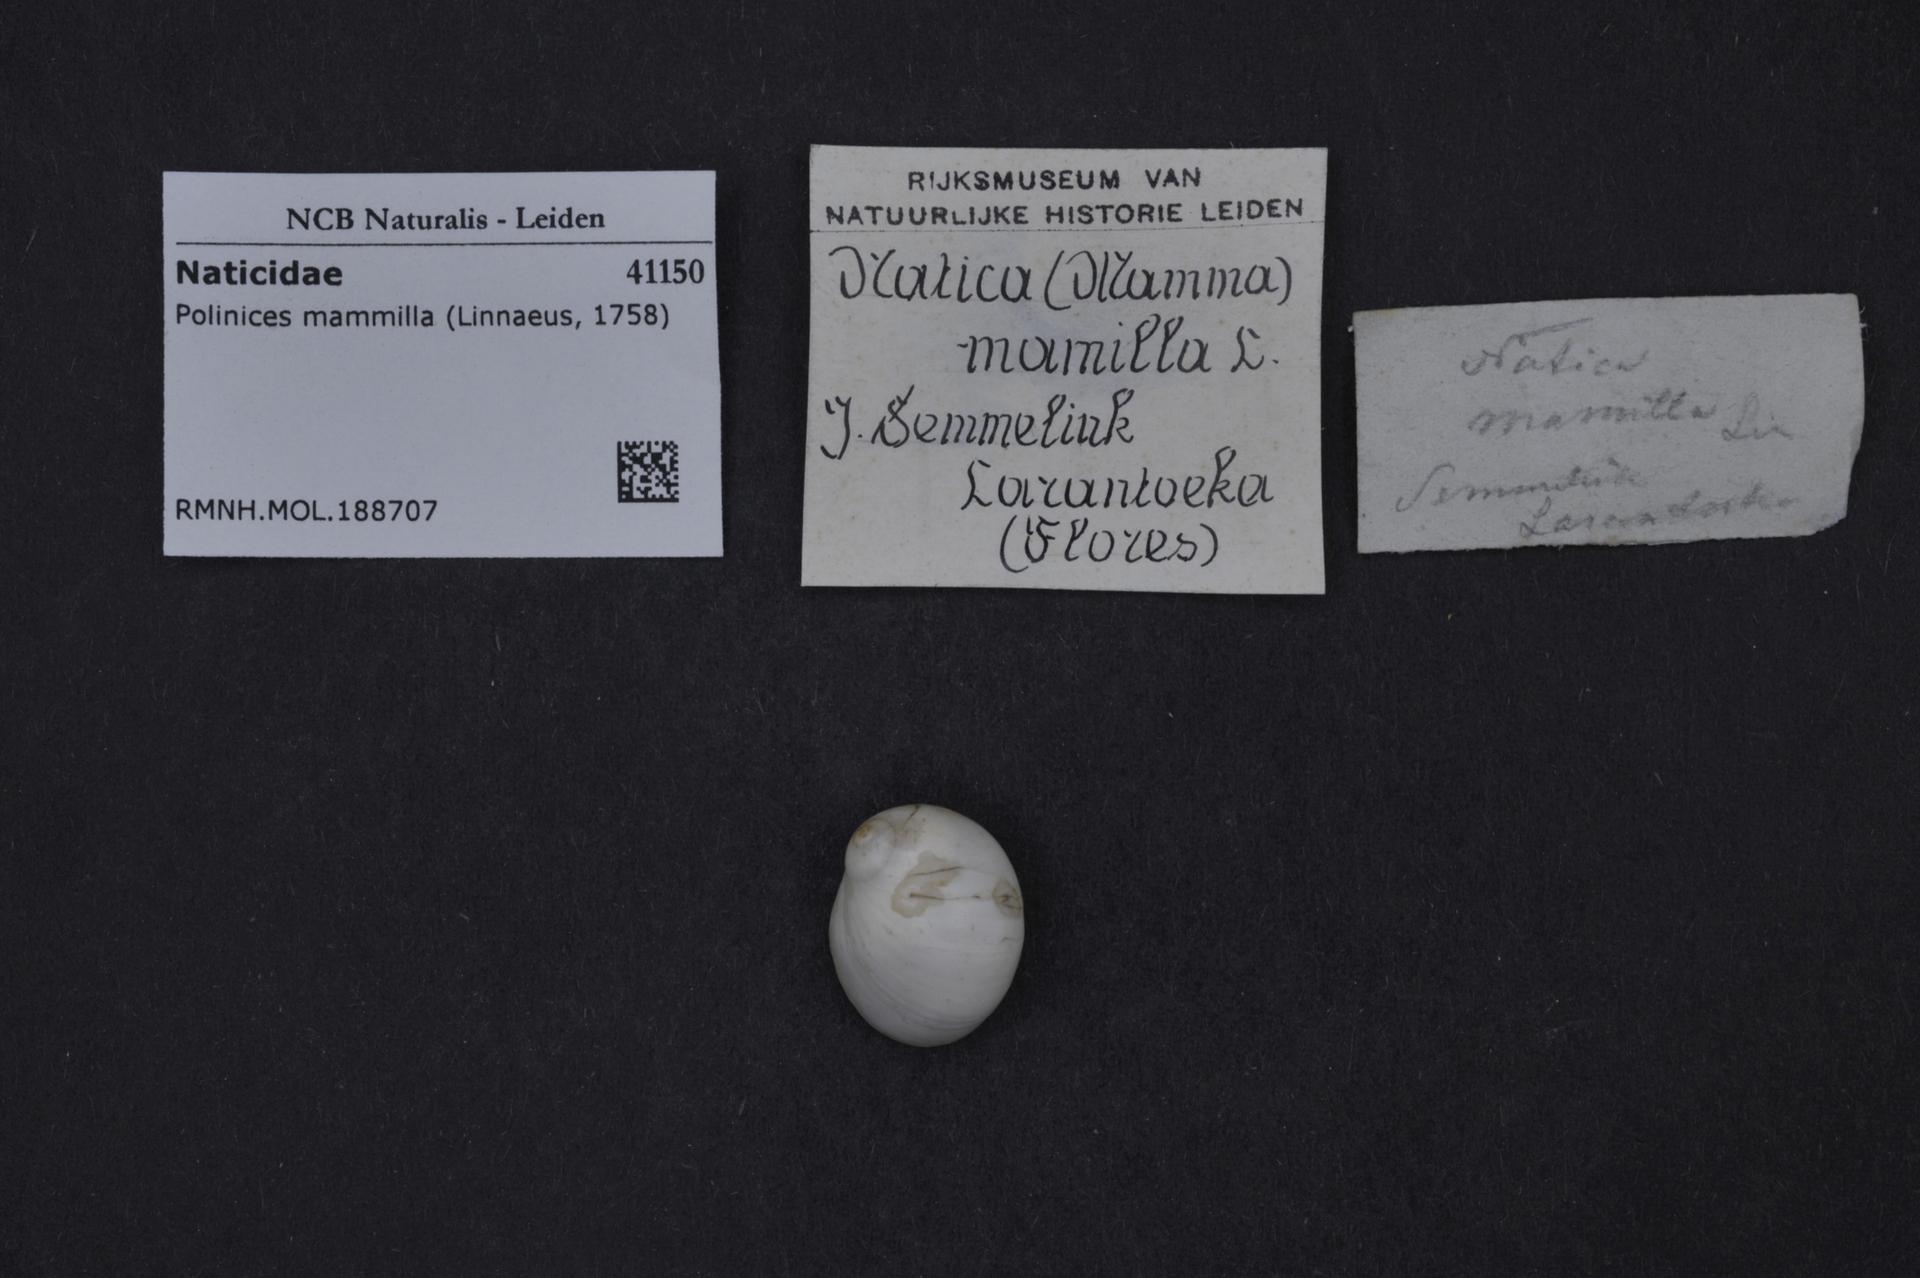 RMNH.MOL.188707 | Polinices mammilla (Linnaeus, 1758)